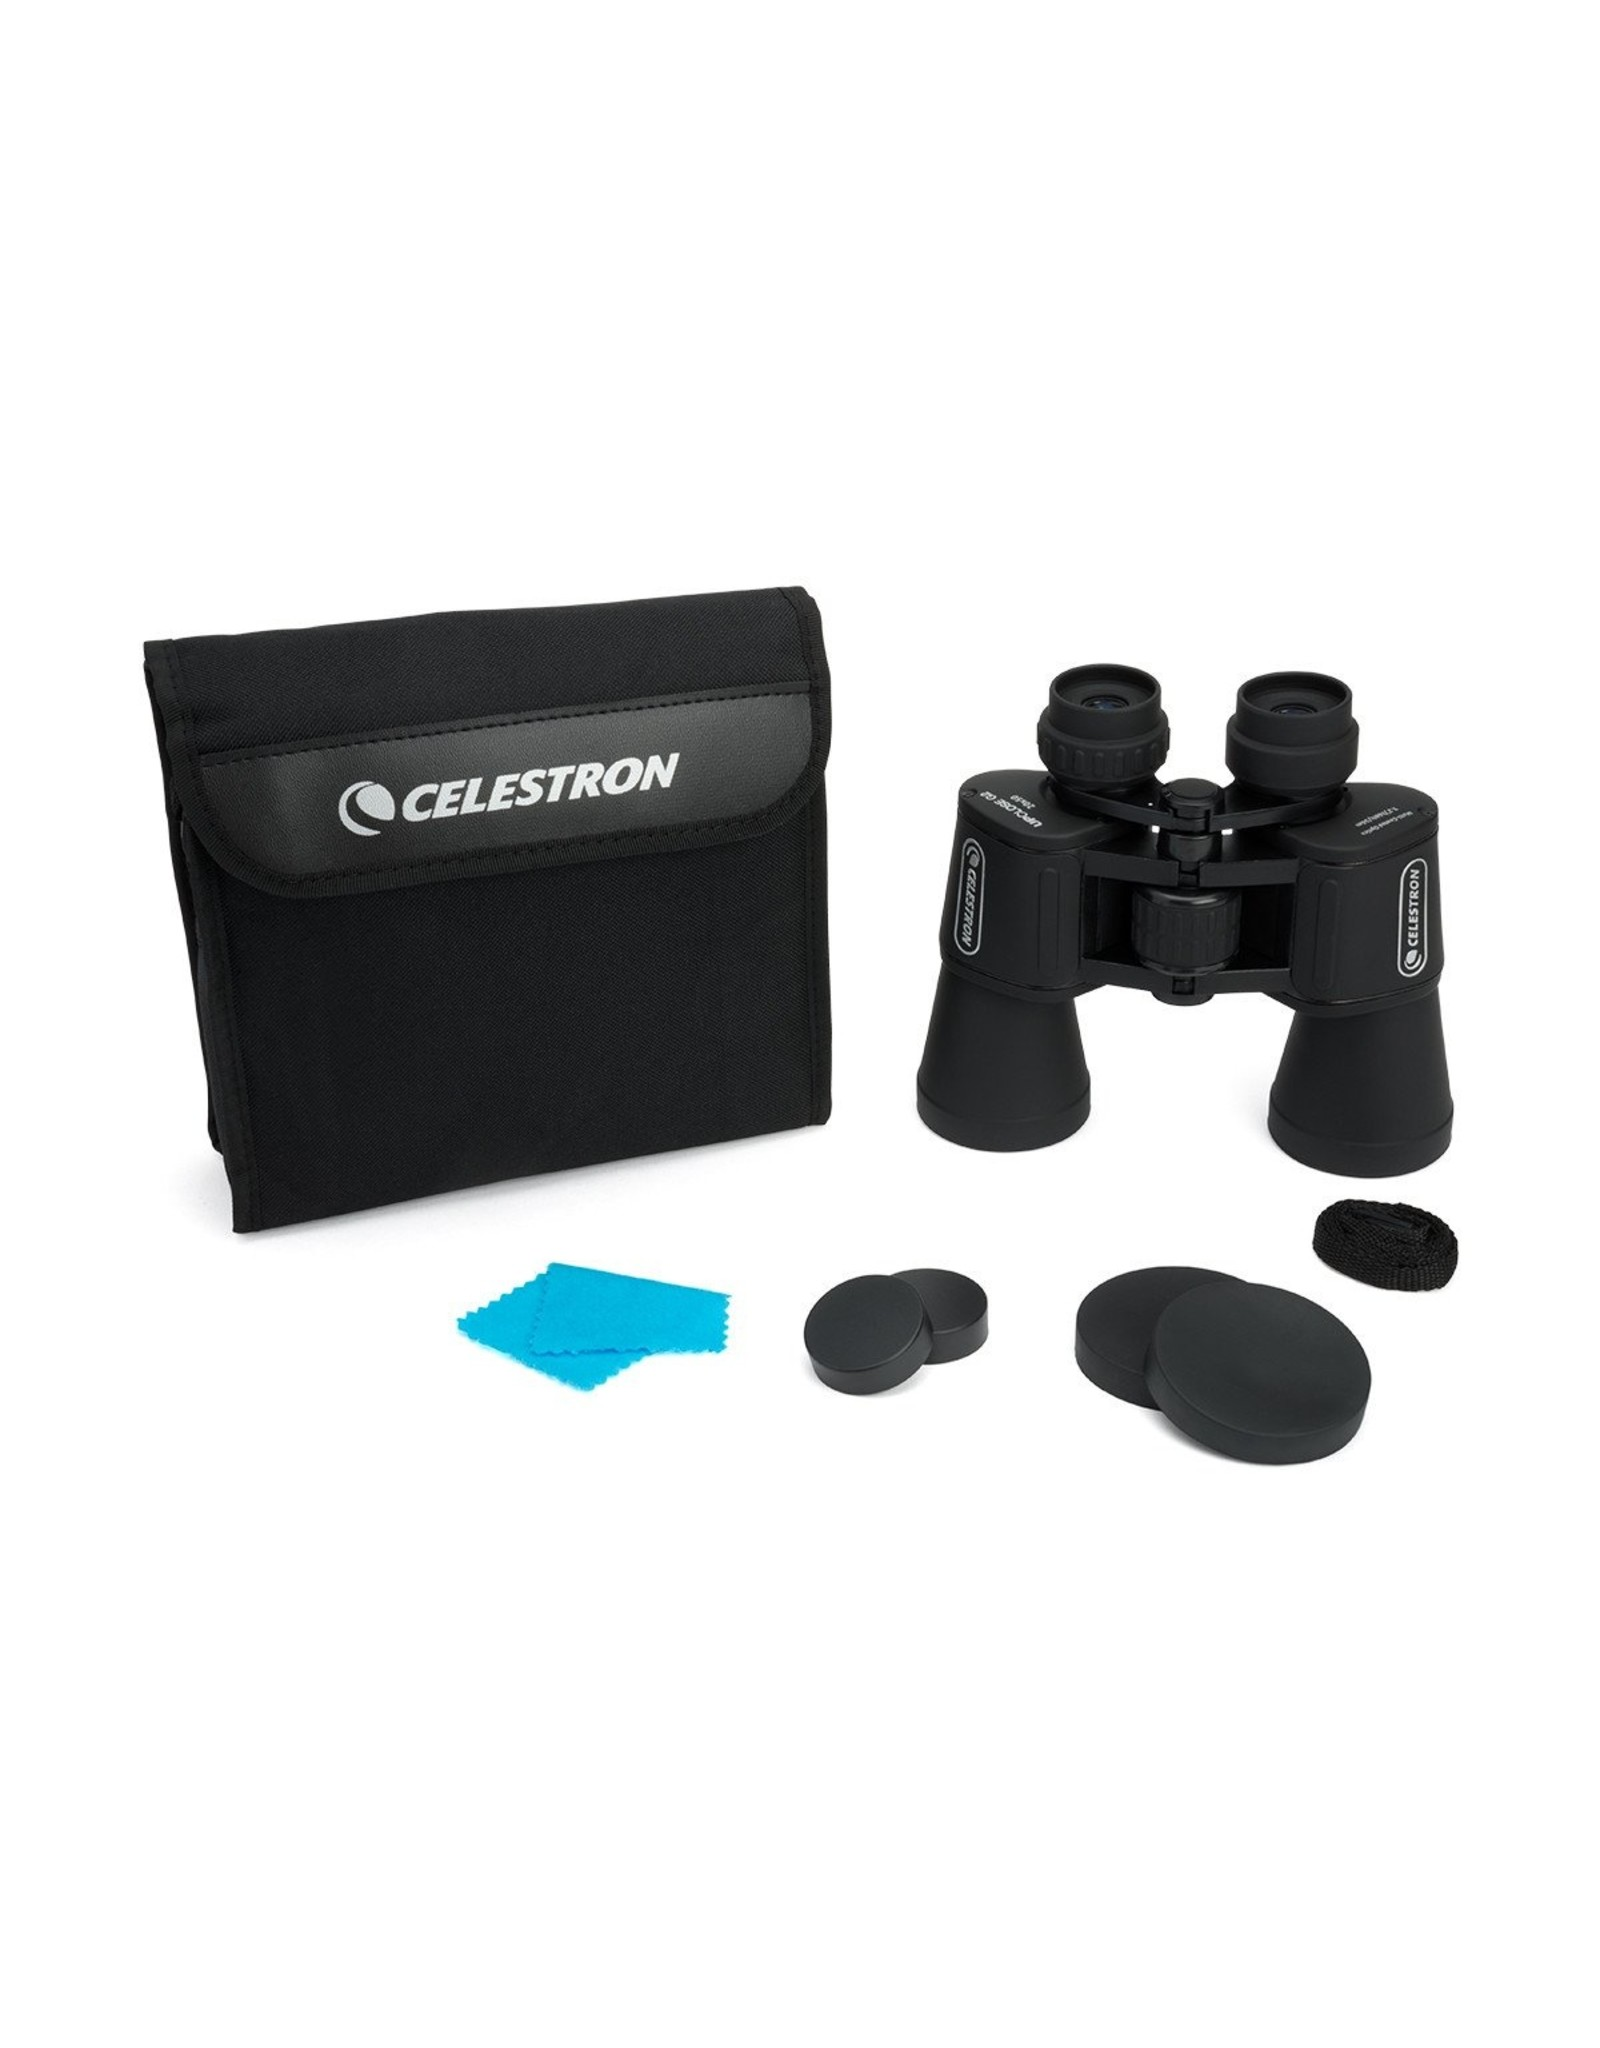 Celestron Celestron 20x50 G2 UpClose